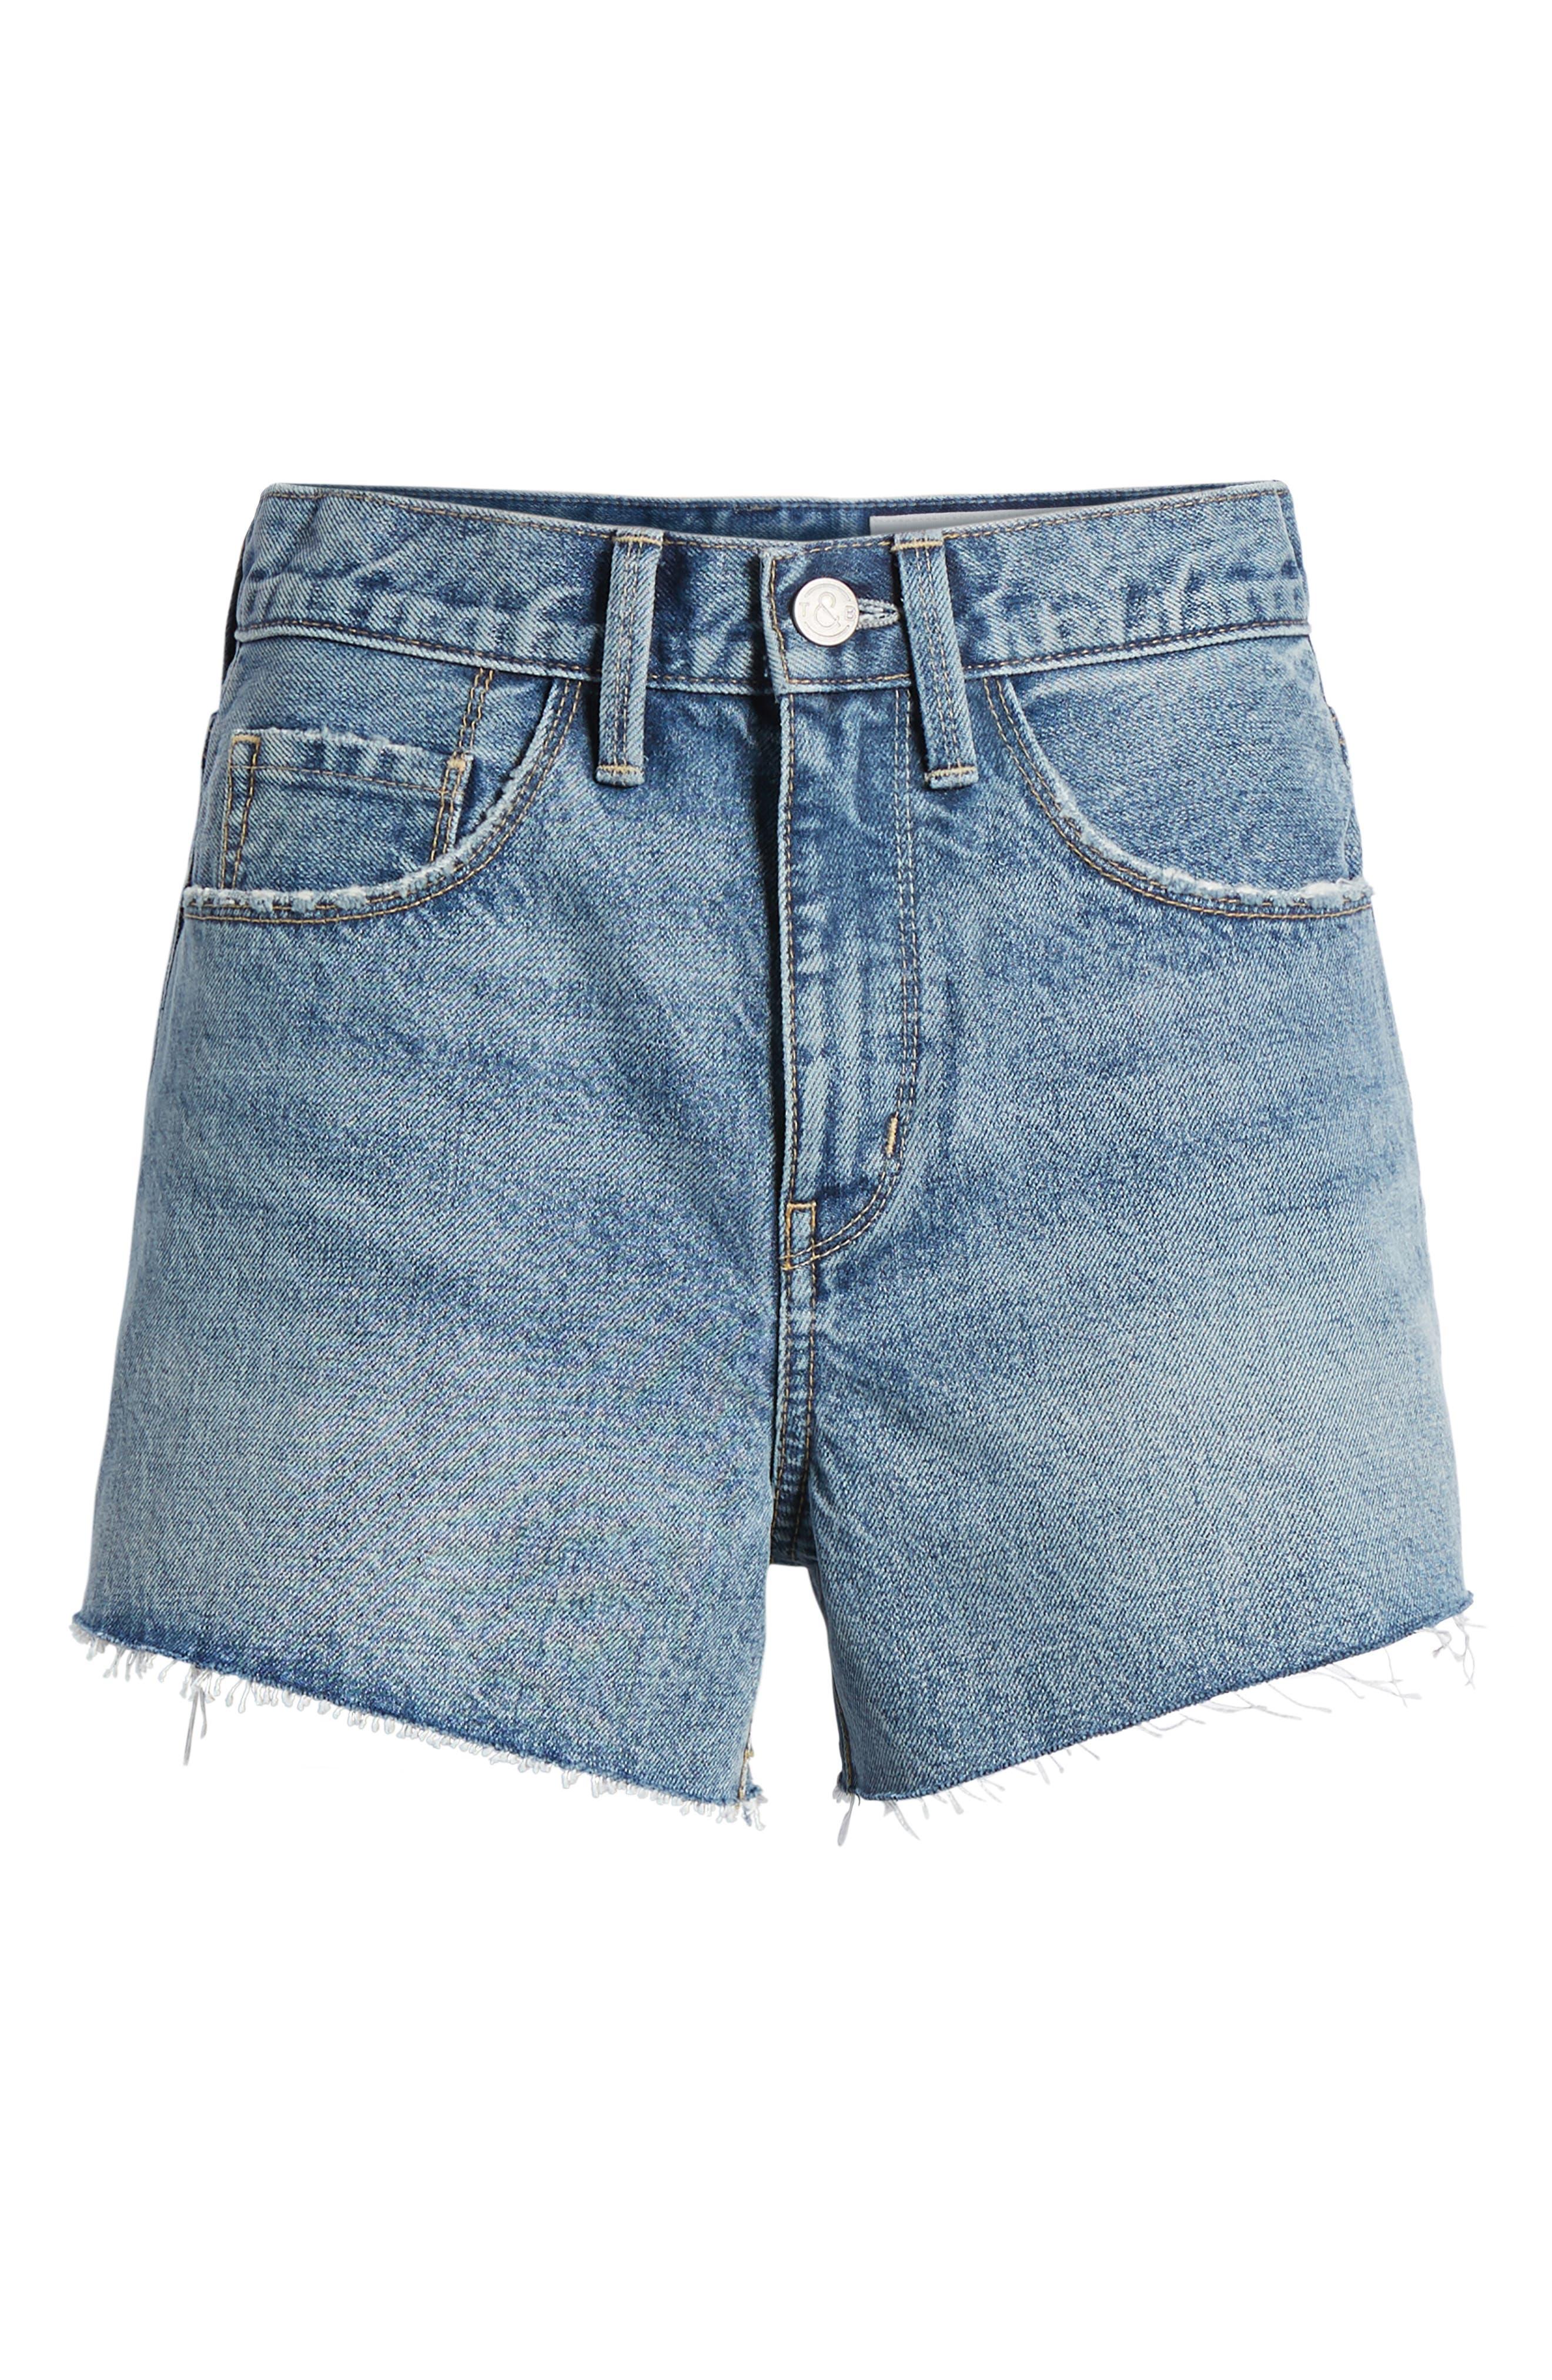 High Waist Cutoff Denim Shorts,                             Alternate thumbnail 7, color,                             420